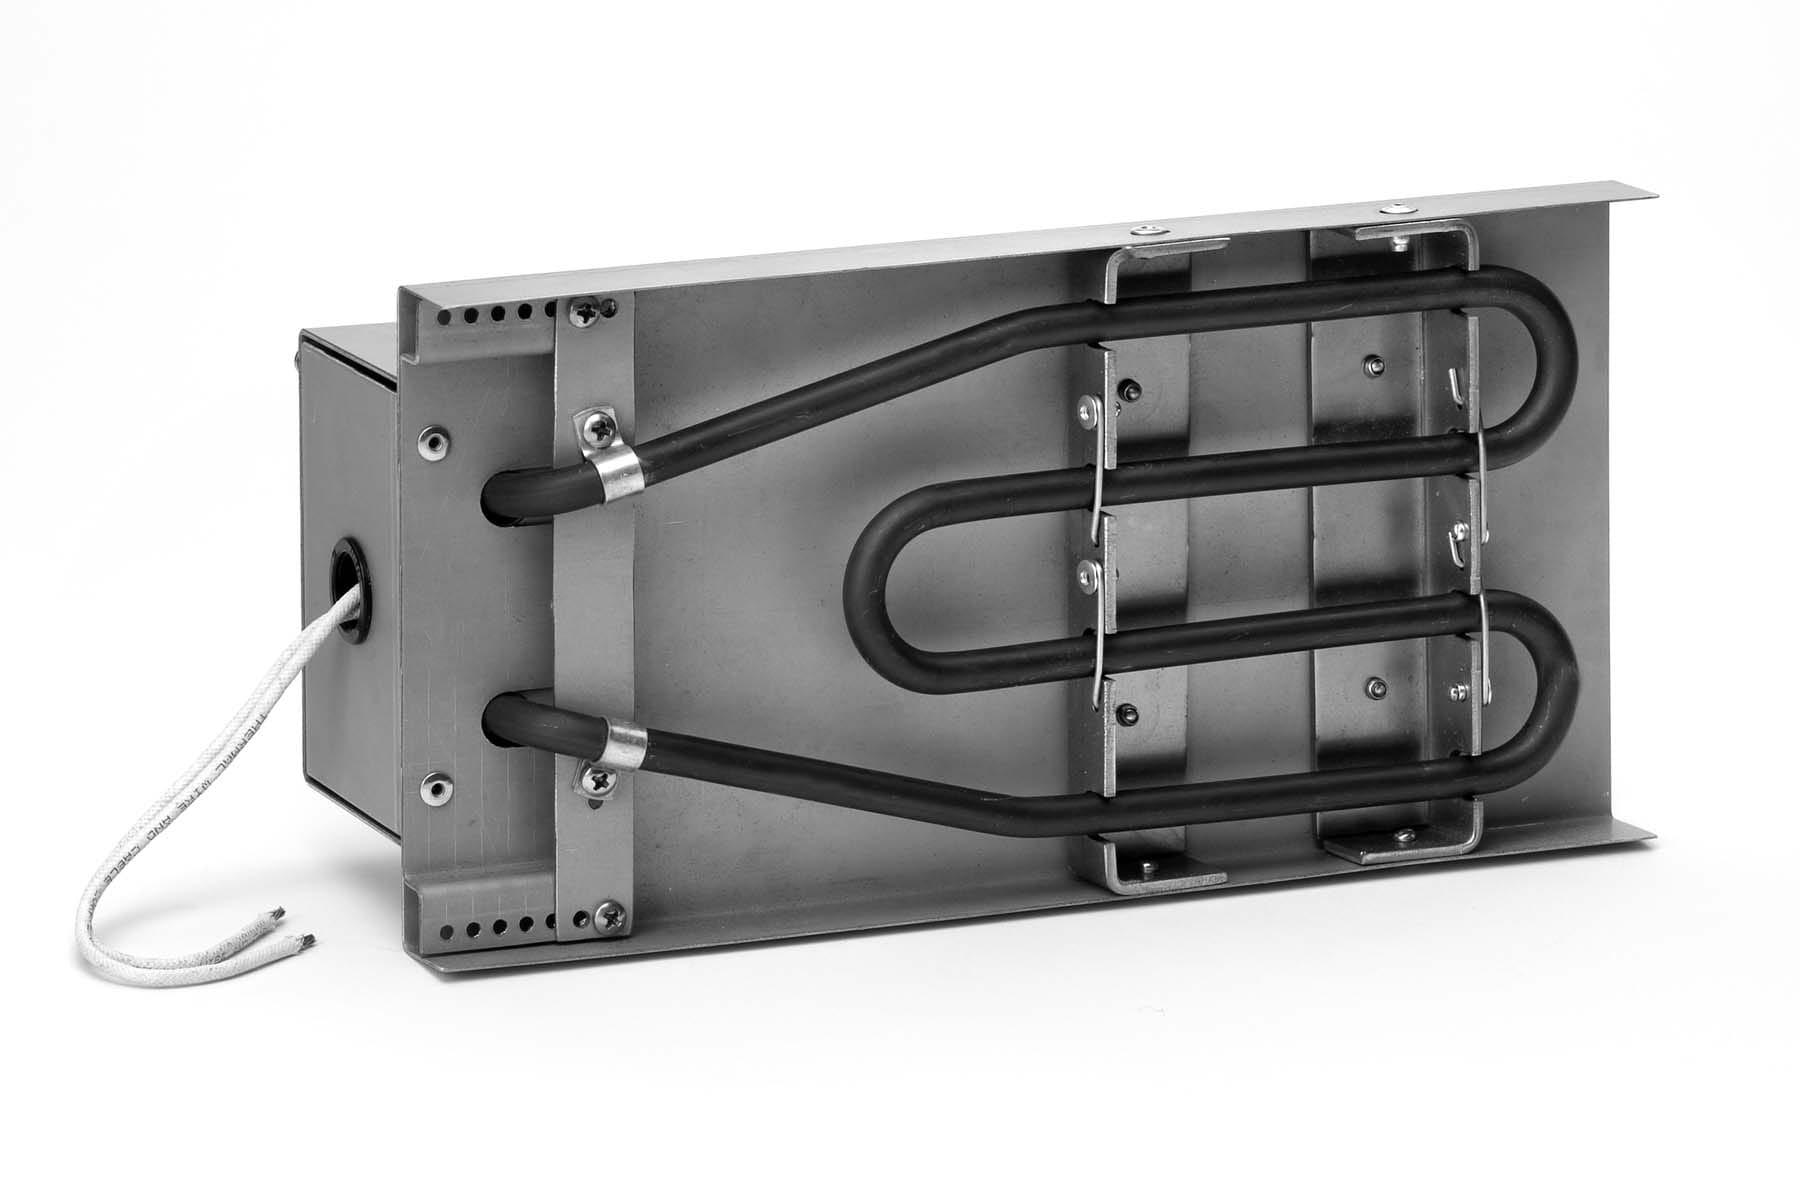 Hopper Wiring Diagram Heater Schematic Diagrams Dish Turbo Hd High Temperature Modular